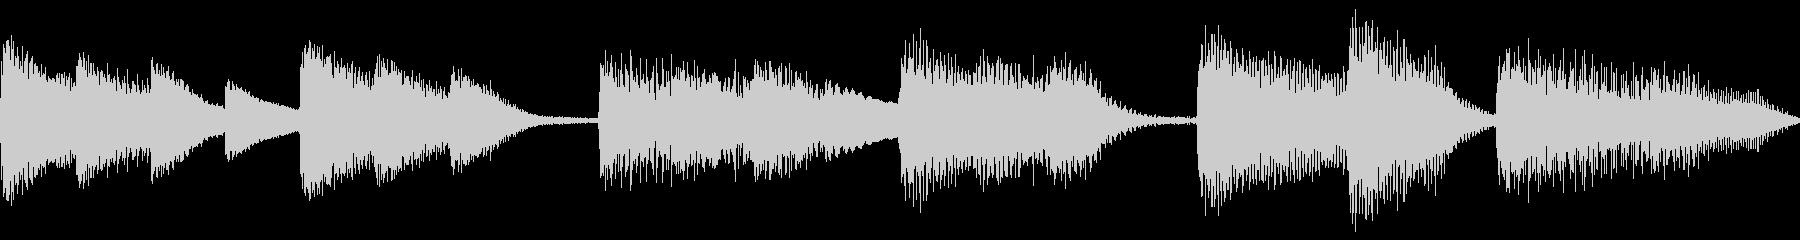 Piano_soloの未再生の波形